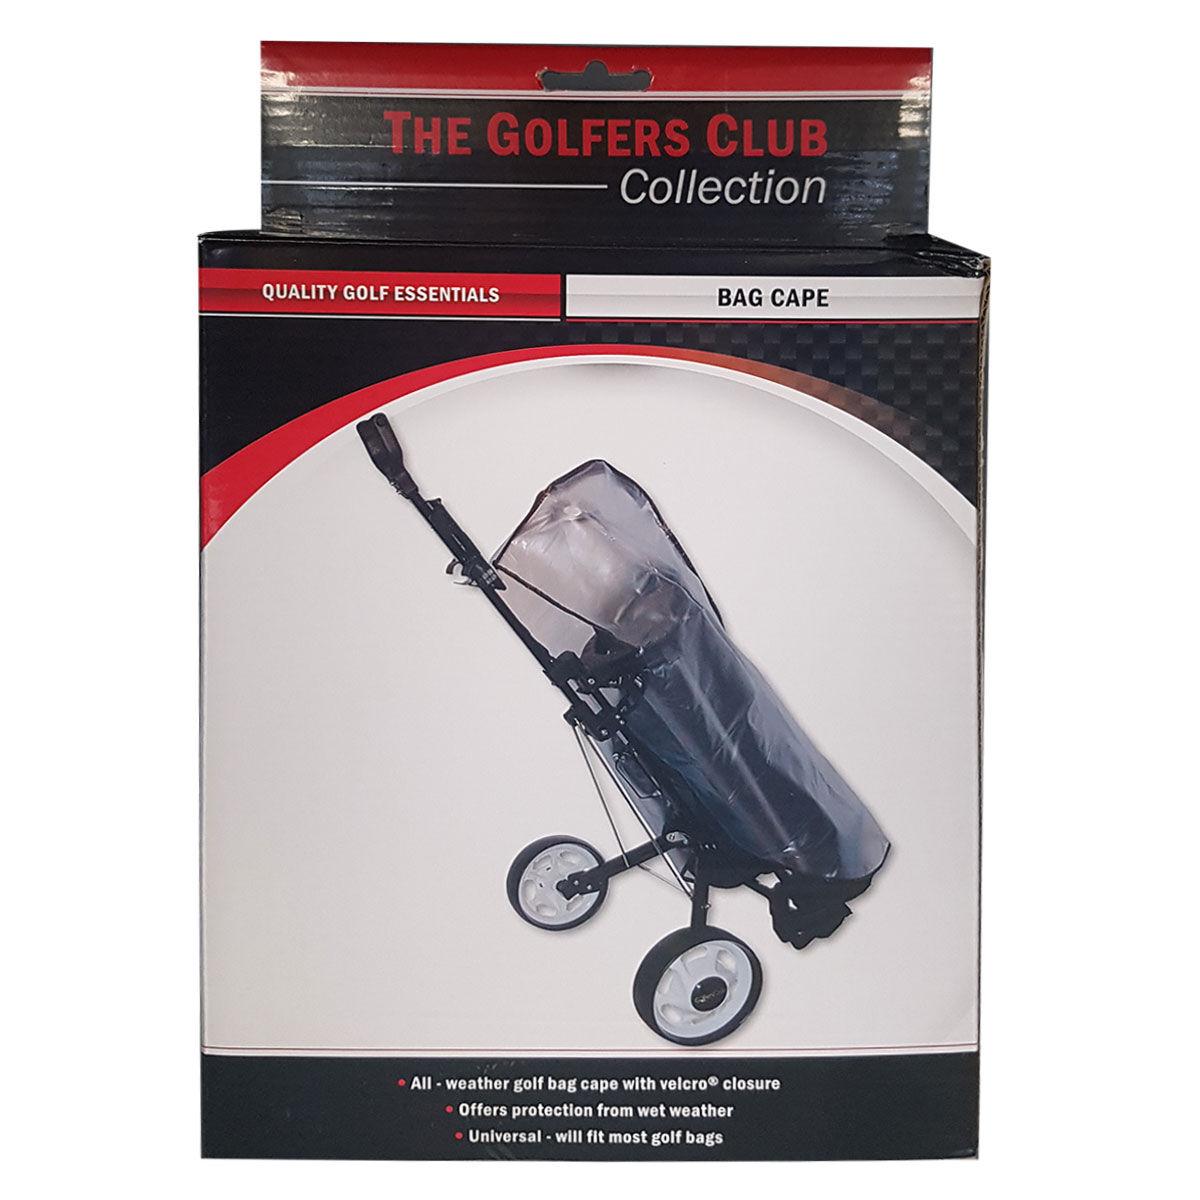 The Golfers Club Clear Bag Cape, Male, Full rain cover, One size, Clear | American Golf